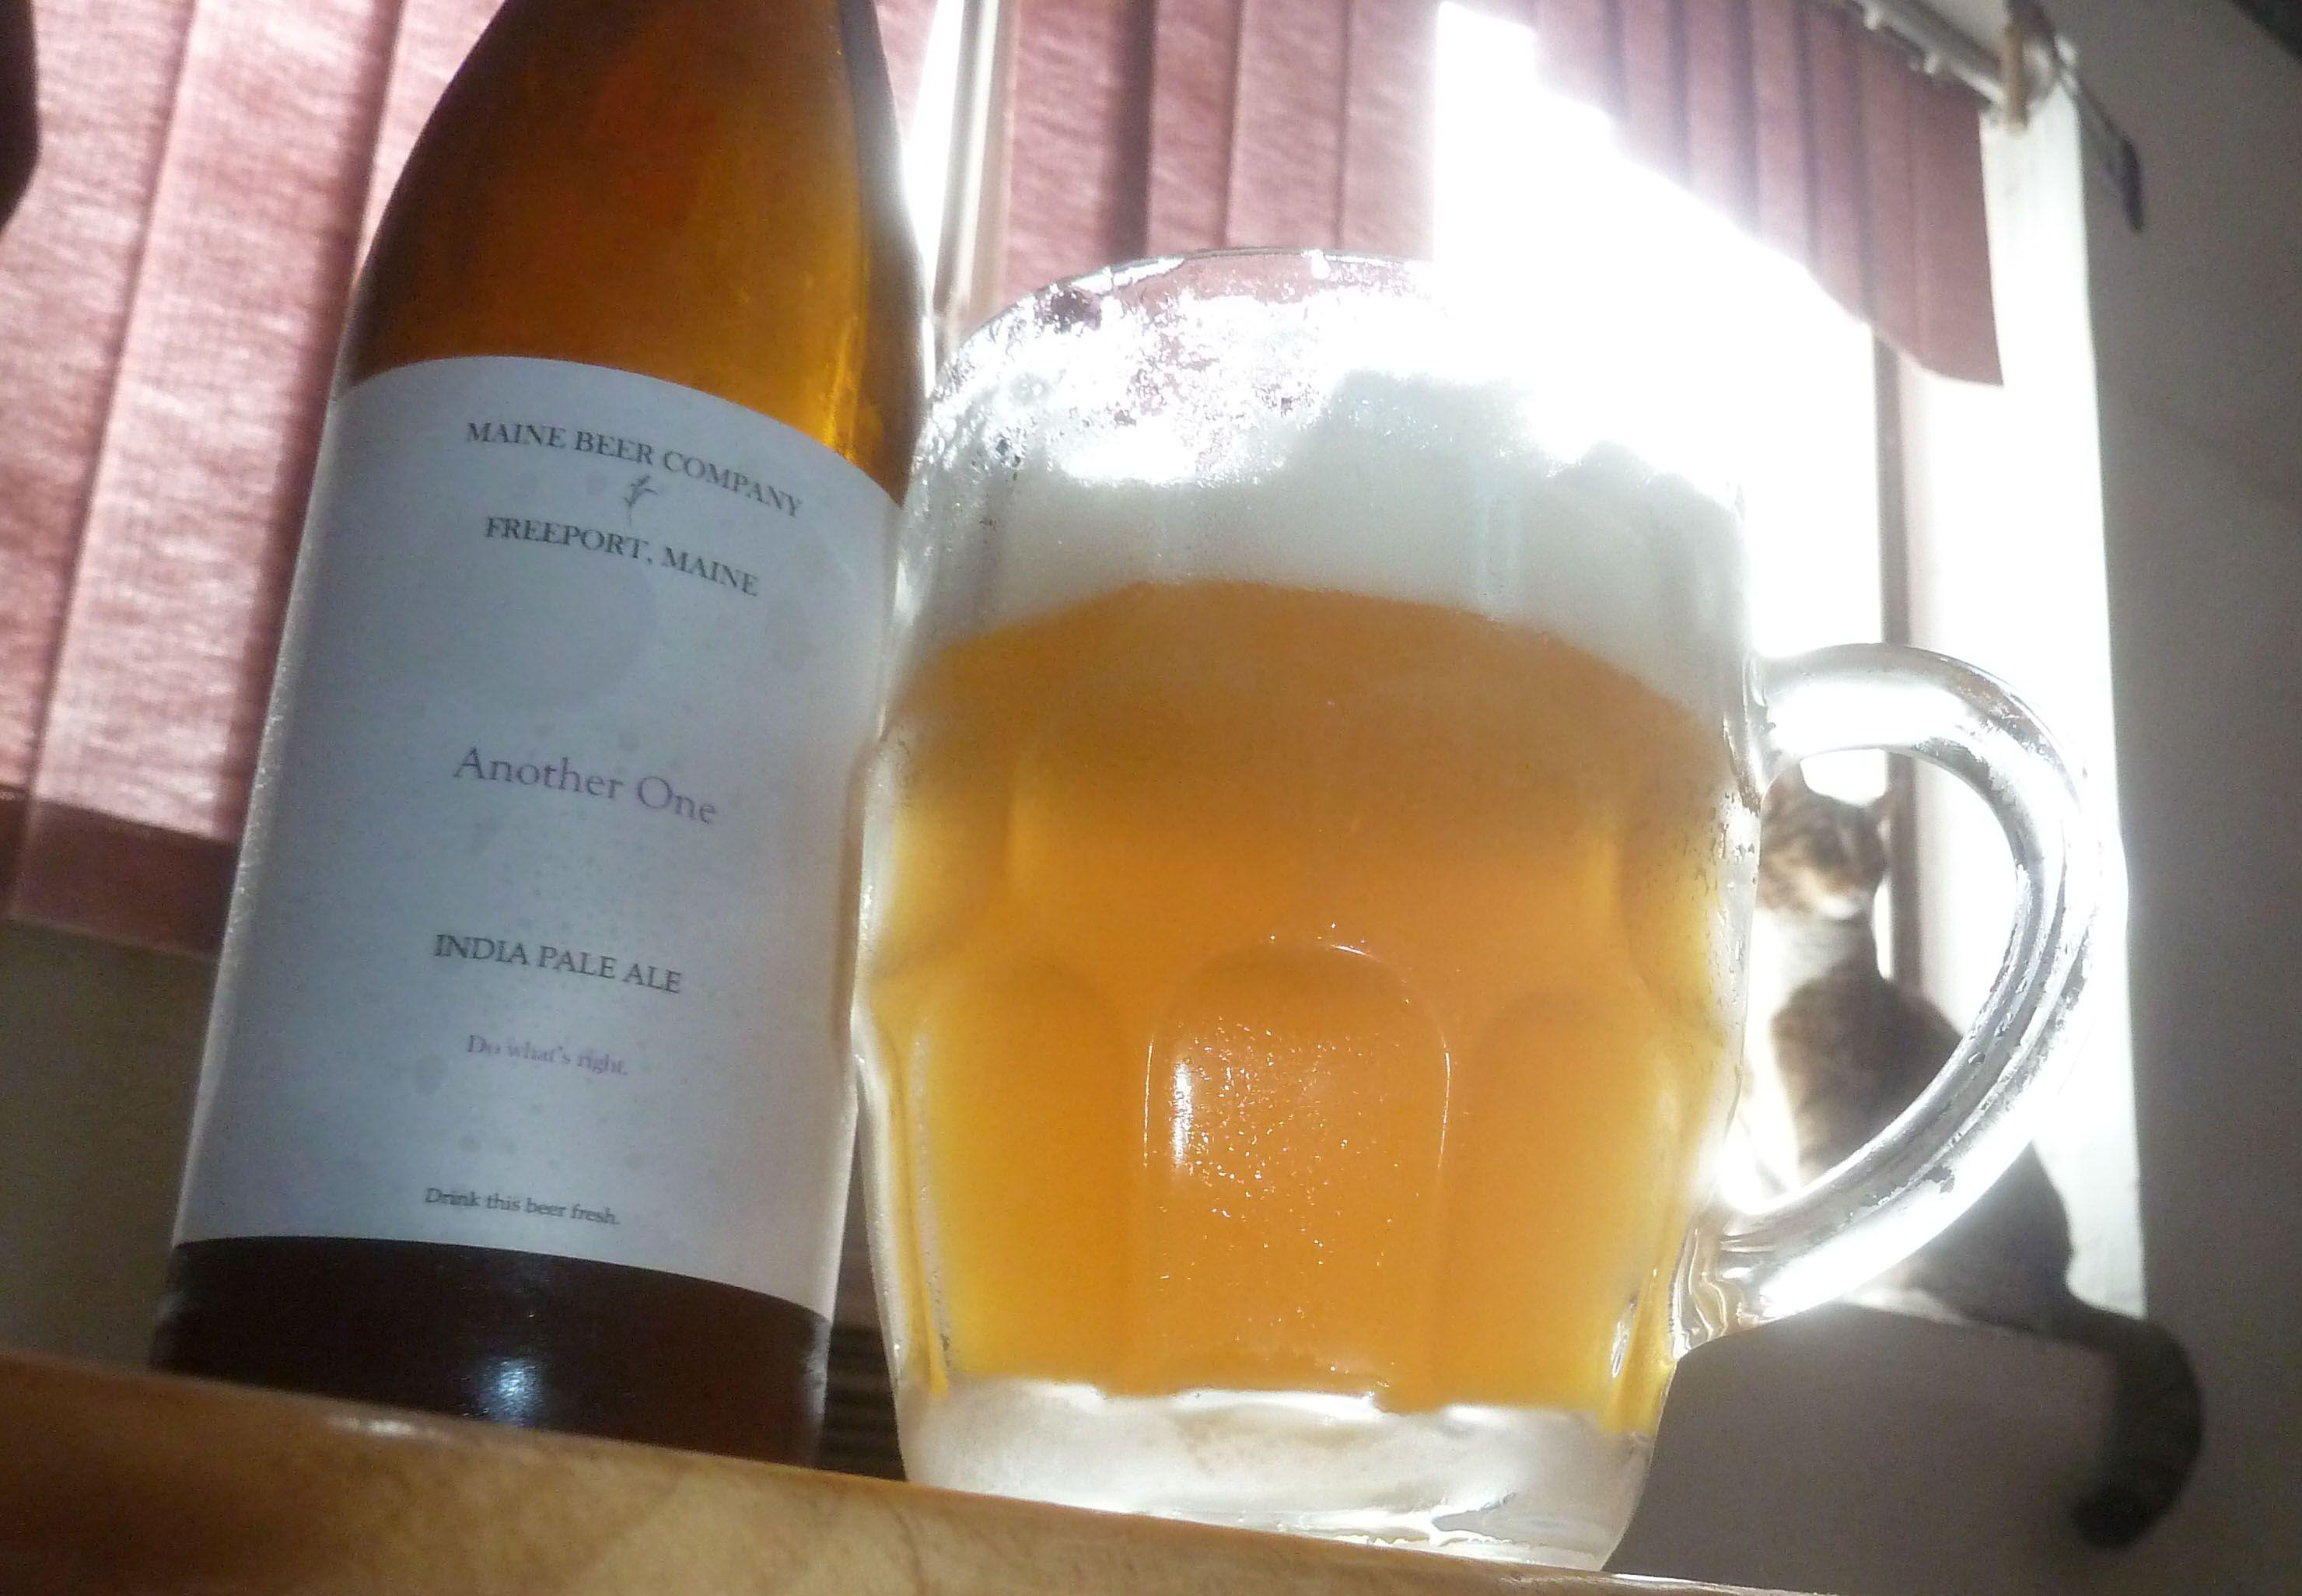 Another One #FavoriteBeers #summershandy #beers #footy #greatnight #beer #friends #craftbeer #sun #cheers #beach #BBQ